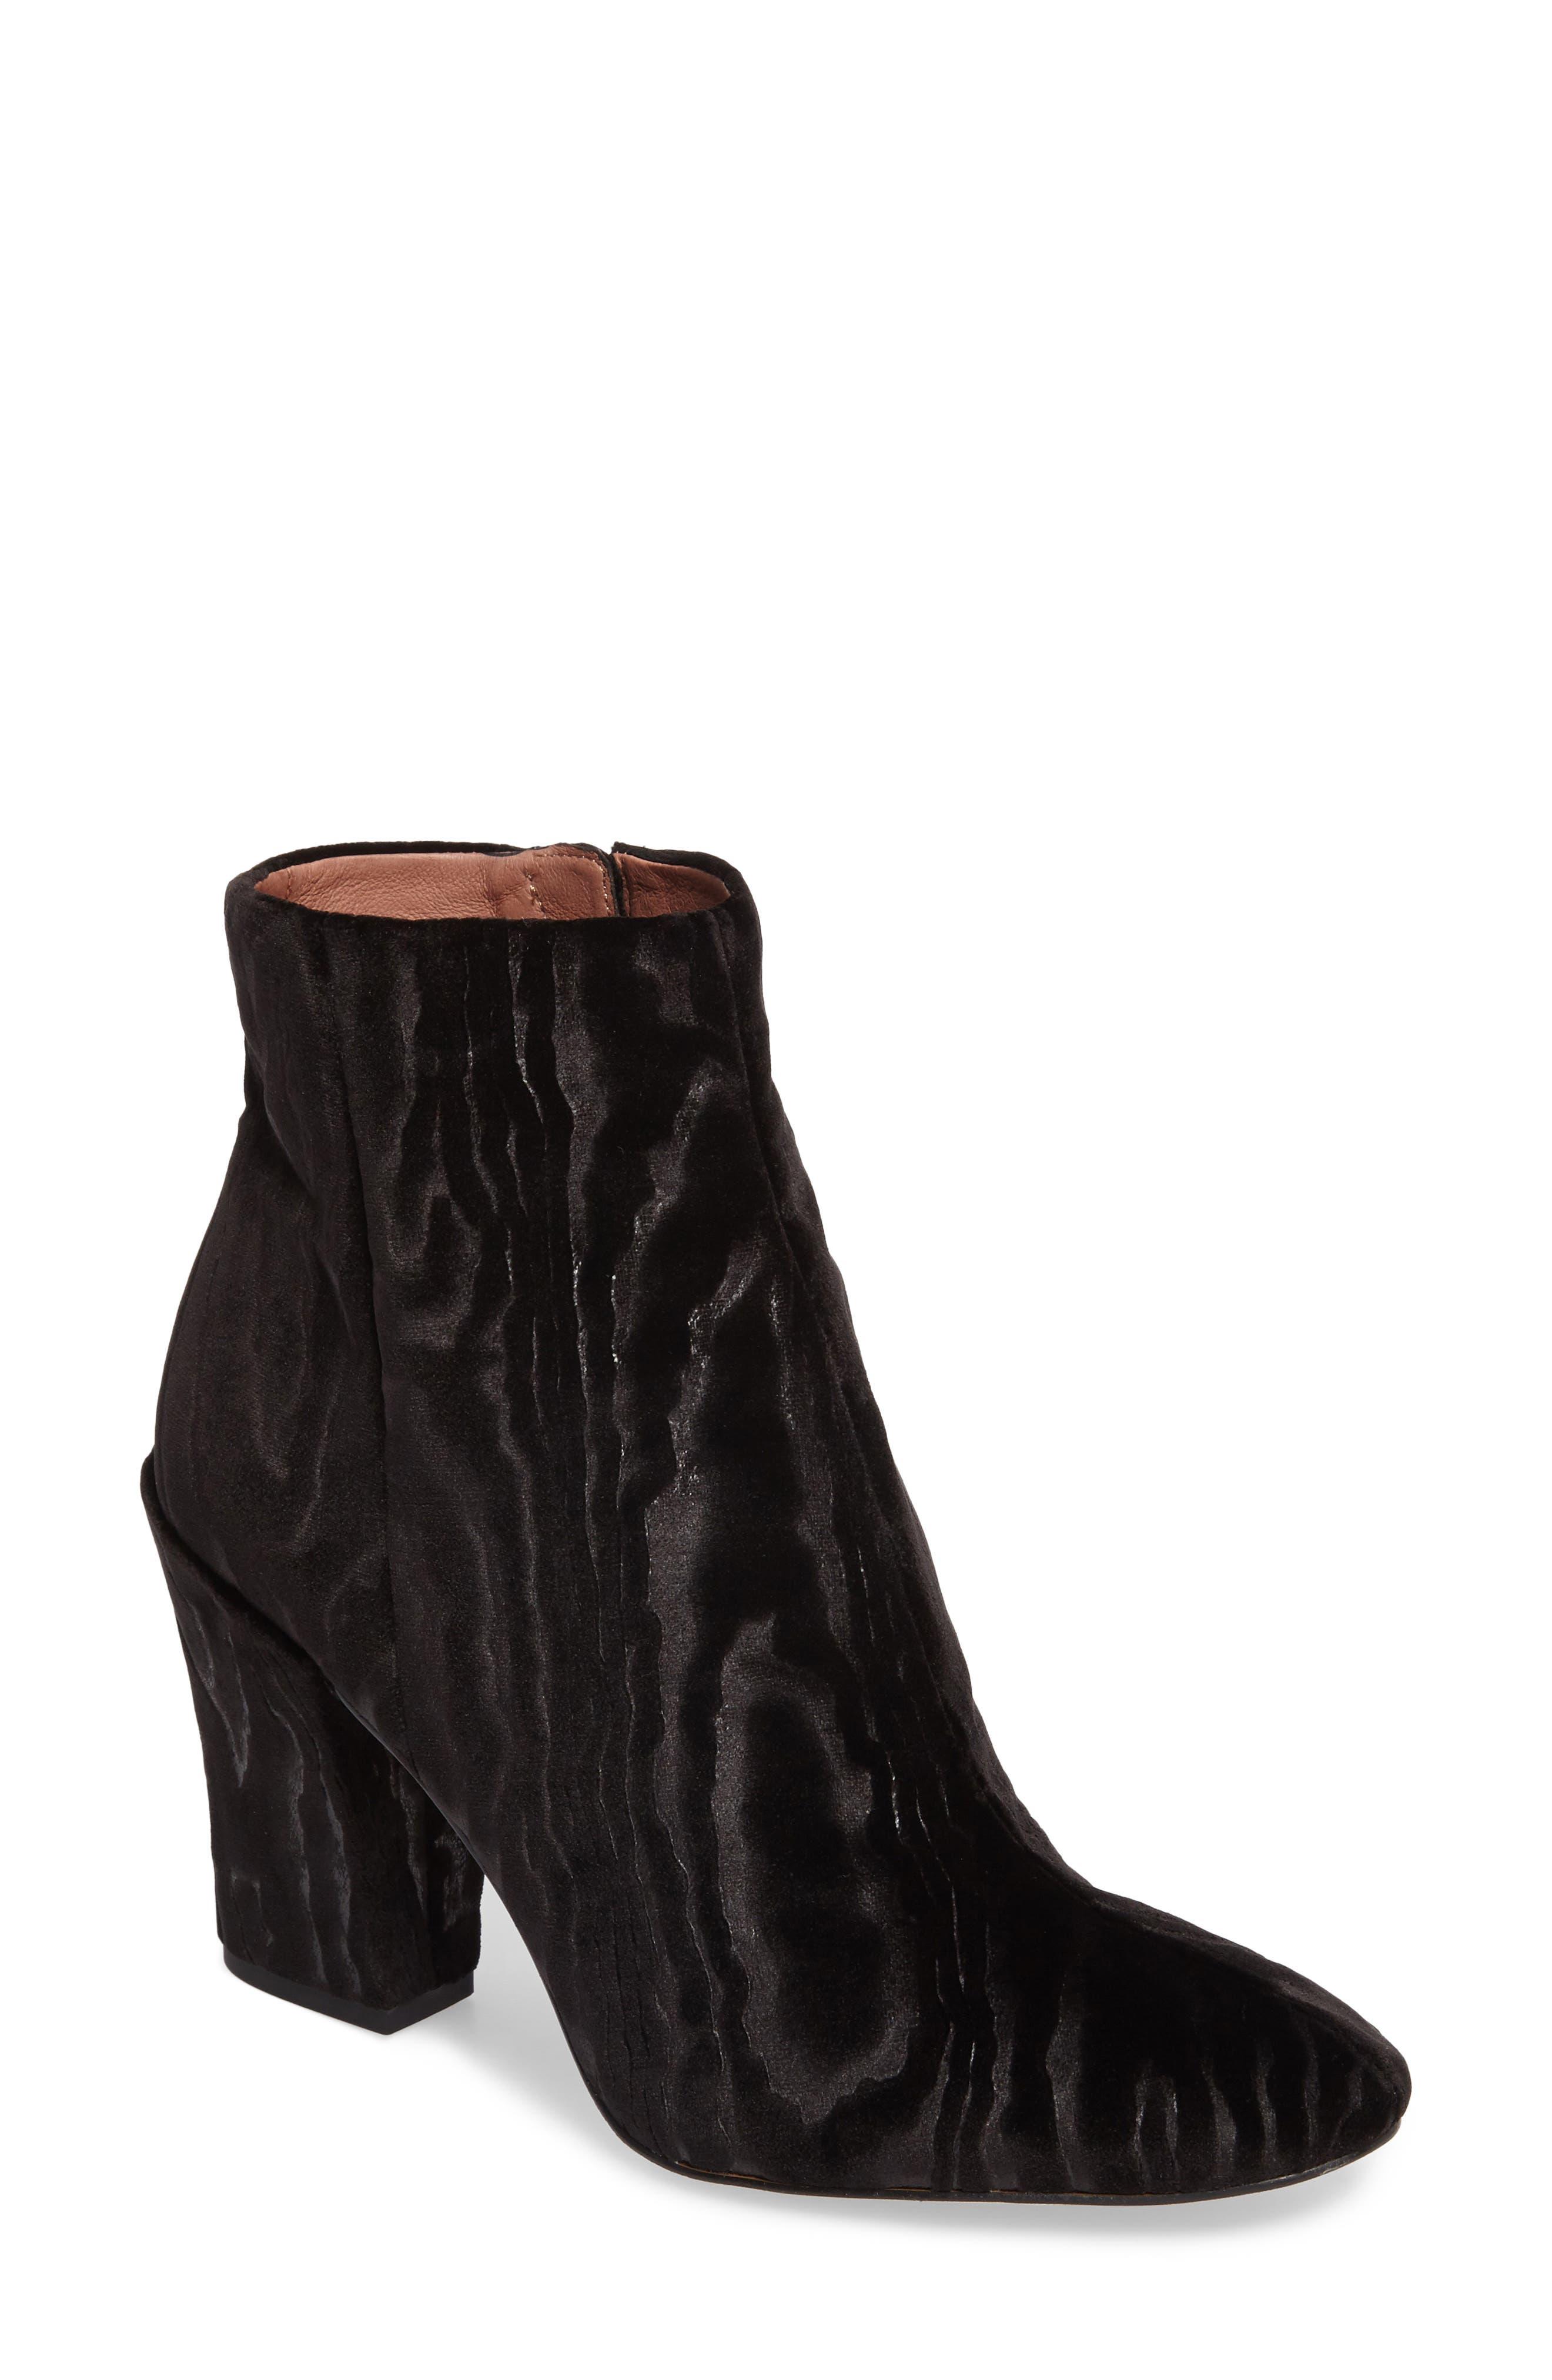 Verdana Bootie,                         Main,                         color, Black Velvet